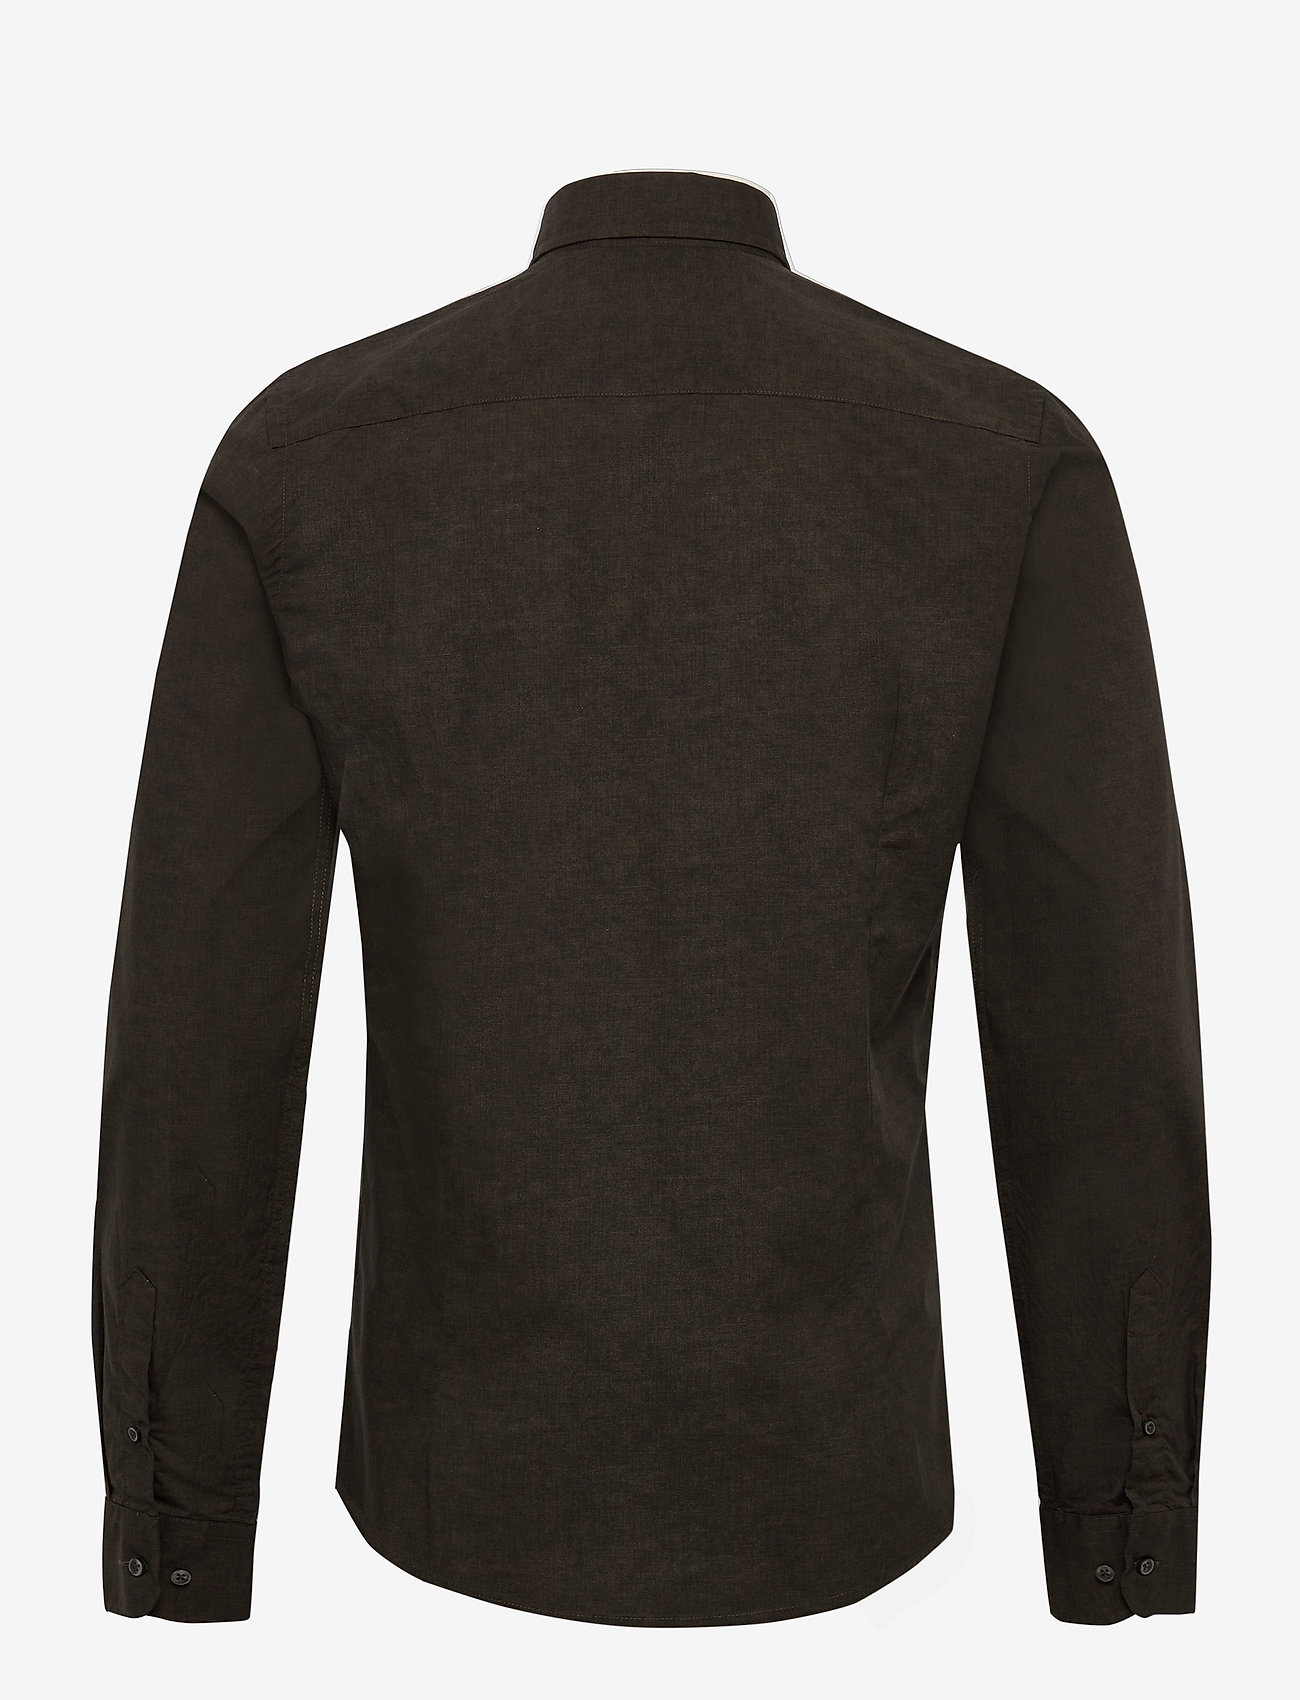 SAND - 8669 - Iver 2 Soft - basic skjortor - olive/khaki - 1